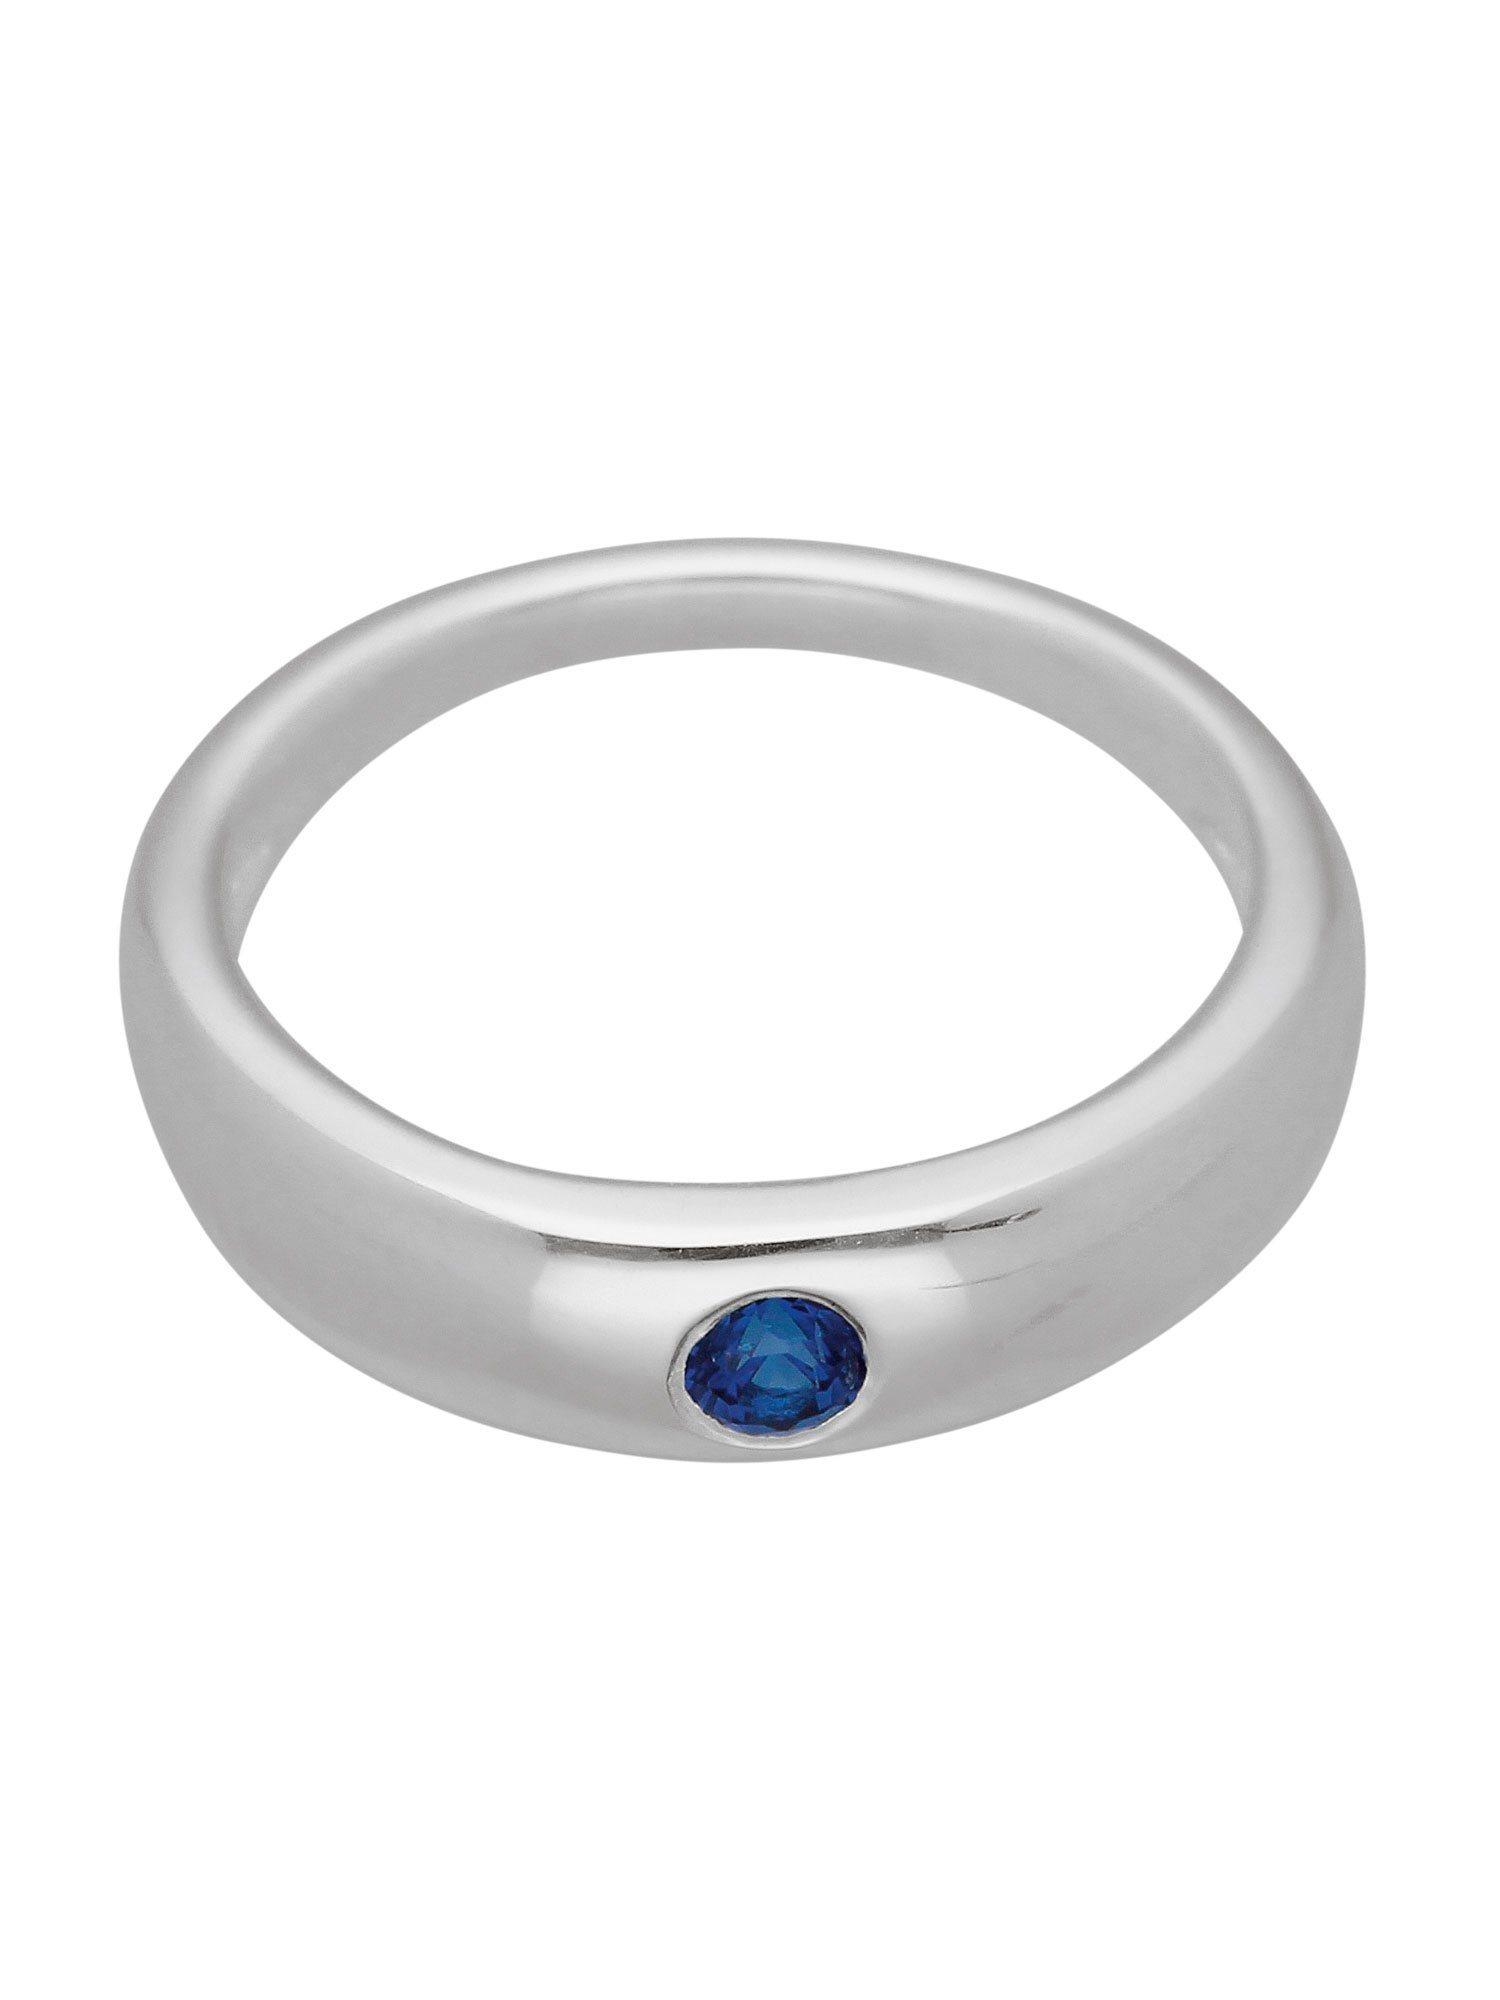 Adelia´s Kettenanhänger »Silber Anhänger« Taufring 925 Sterling Silber mit Safir Ø 1.09 cm | Schmuck > Halsketten > Ketten ohne Anhänger | Blau | Adelia´s